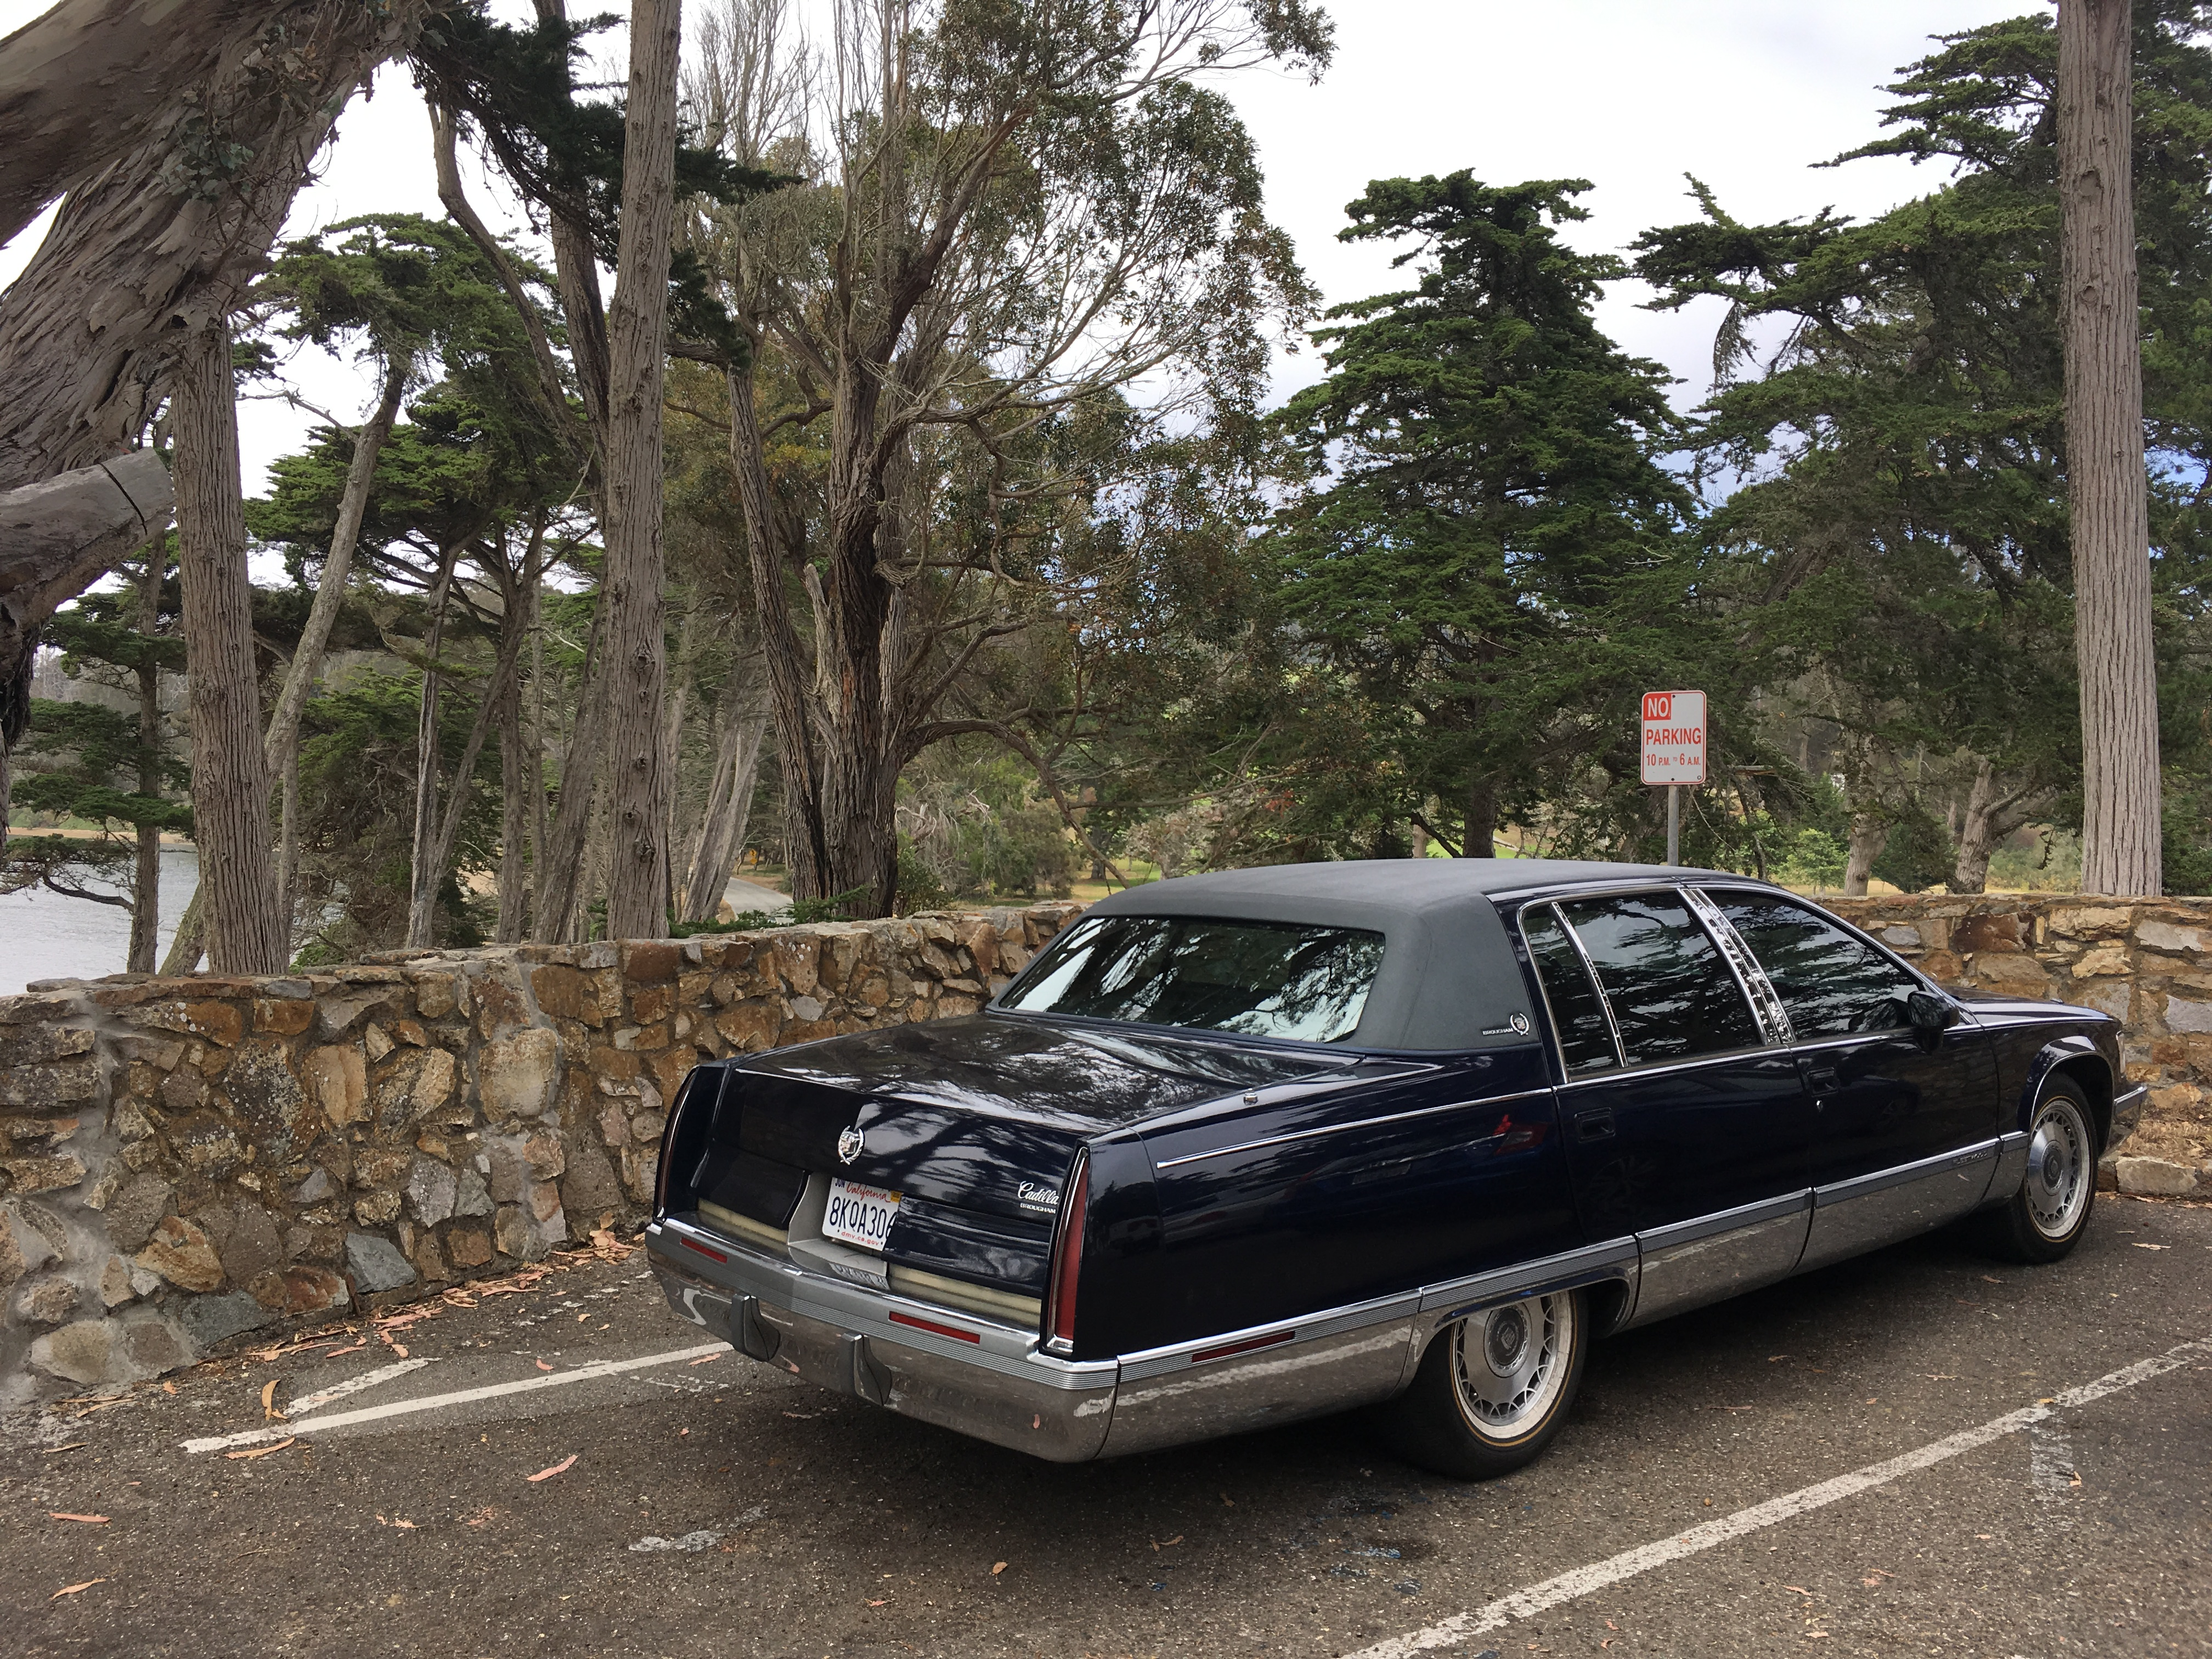 1994 Cadillac Fleetwood Brougham Edition